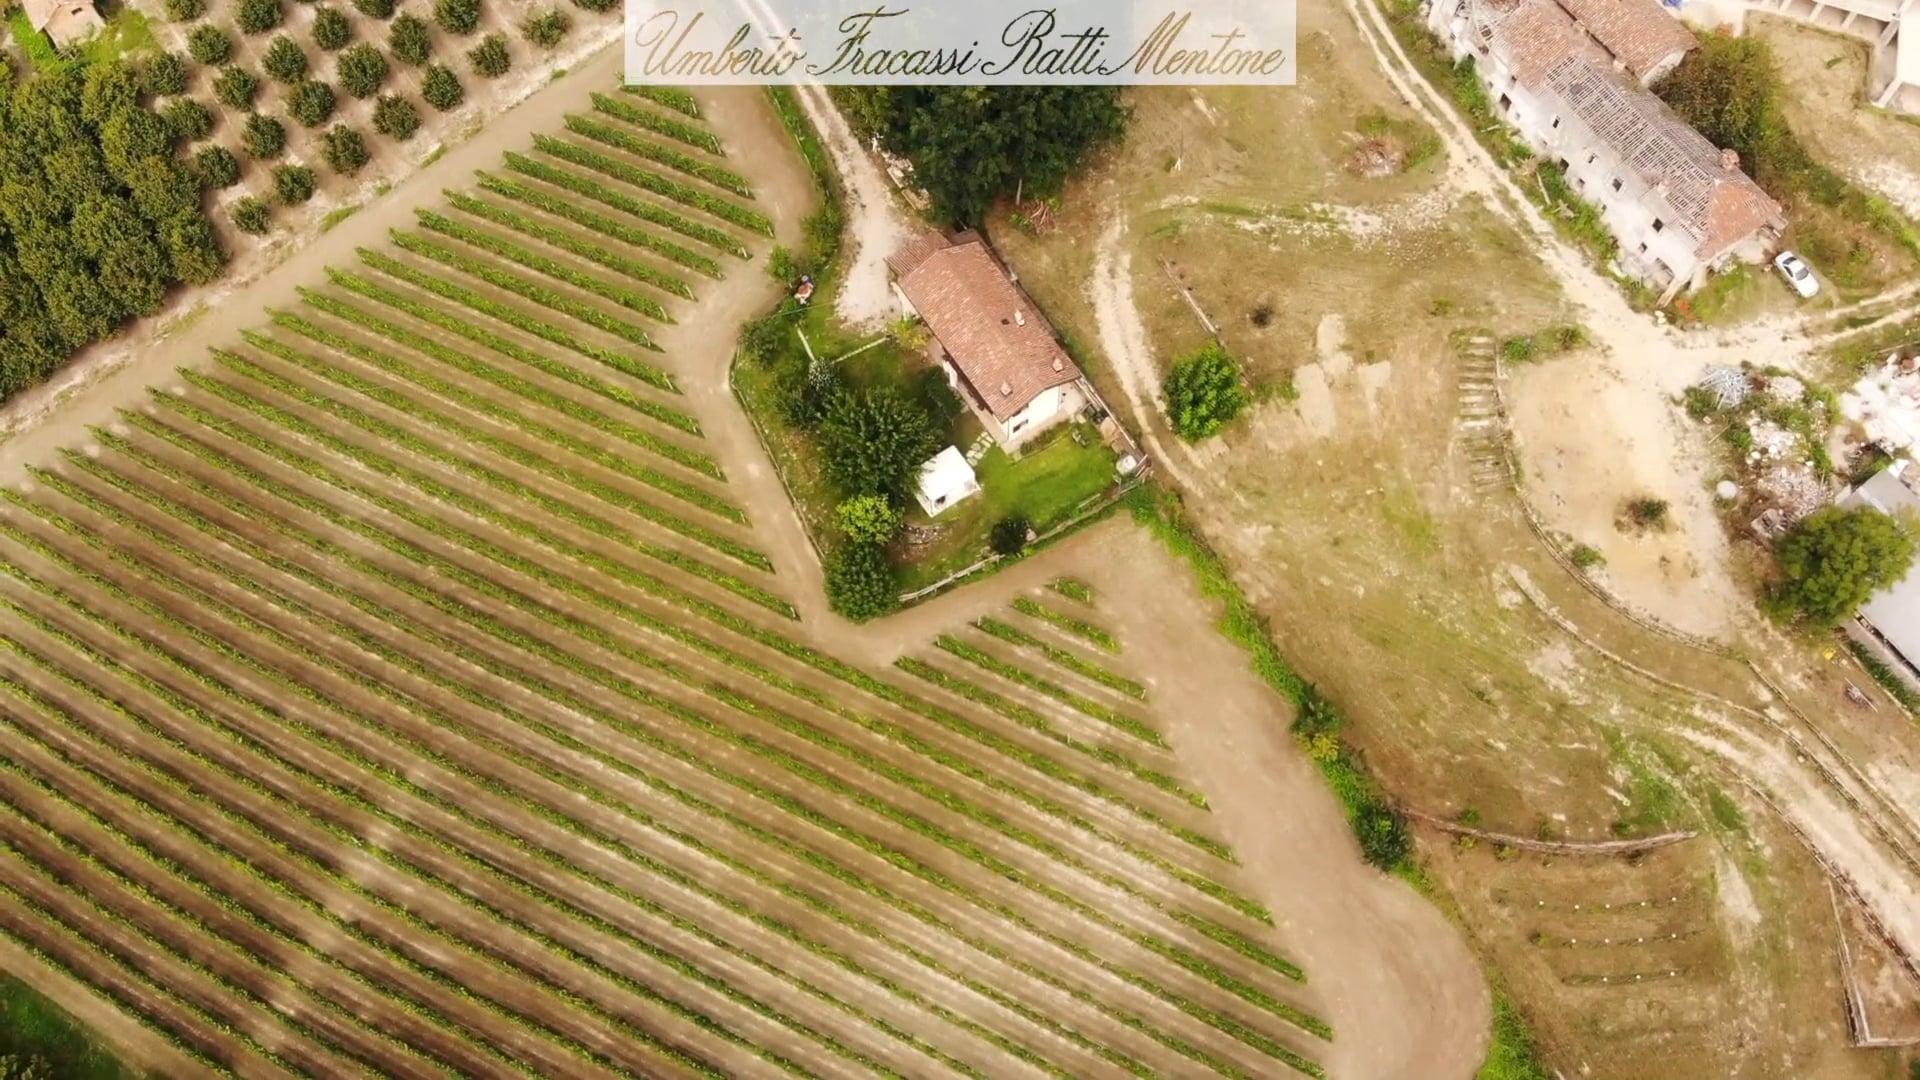 Umberto Fracassi | Il vigneto tra Cherasco e La Morra | The vineyard between Cherasco e La Morra